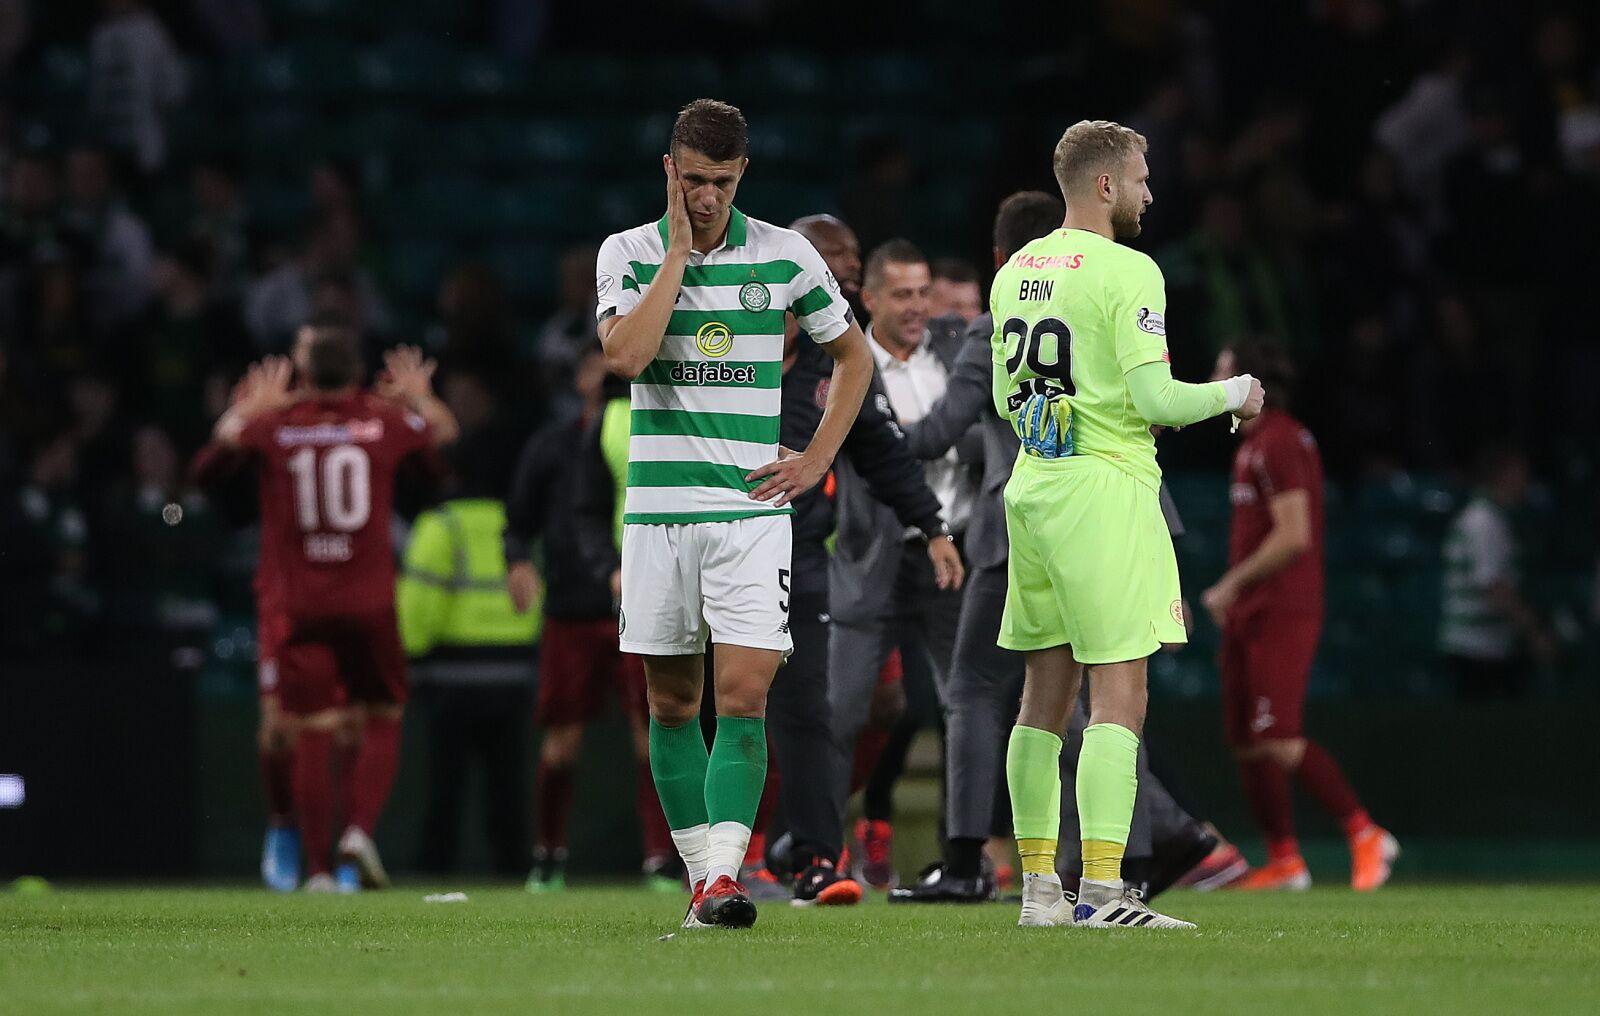 Celtic FC Confirms Star will Undergo Surgery on Knee